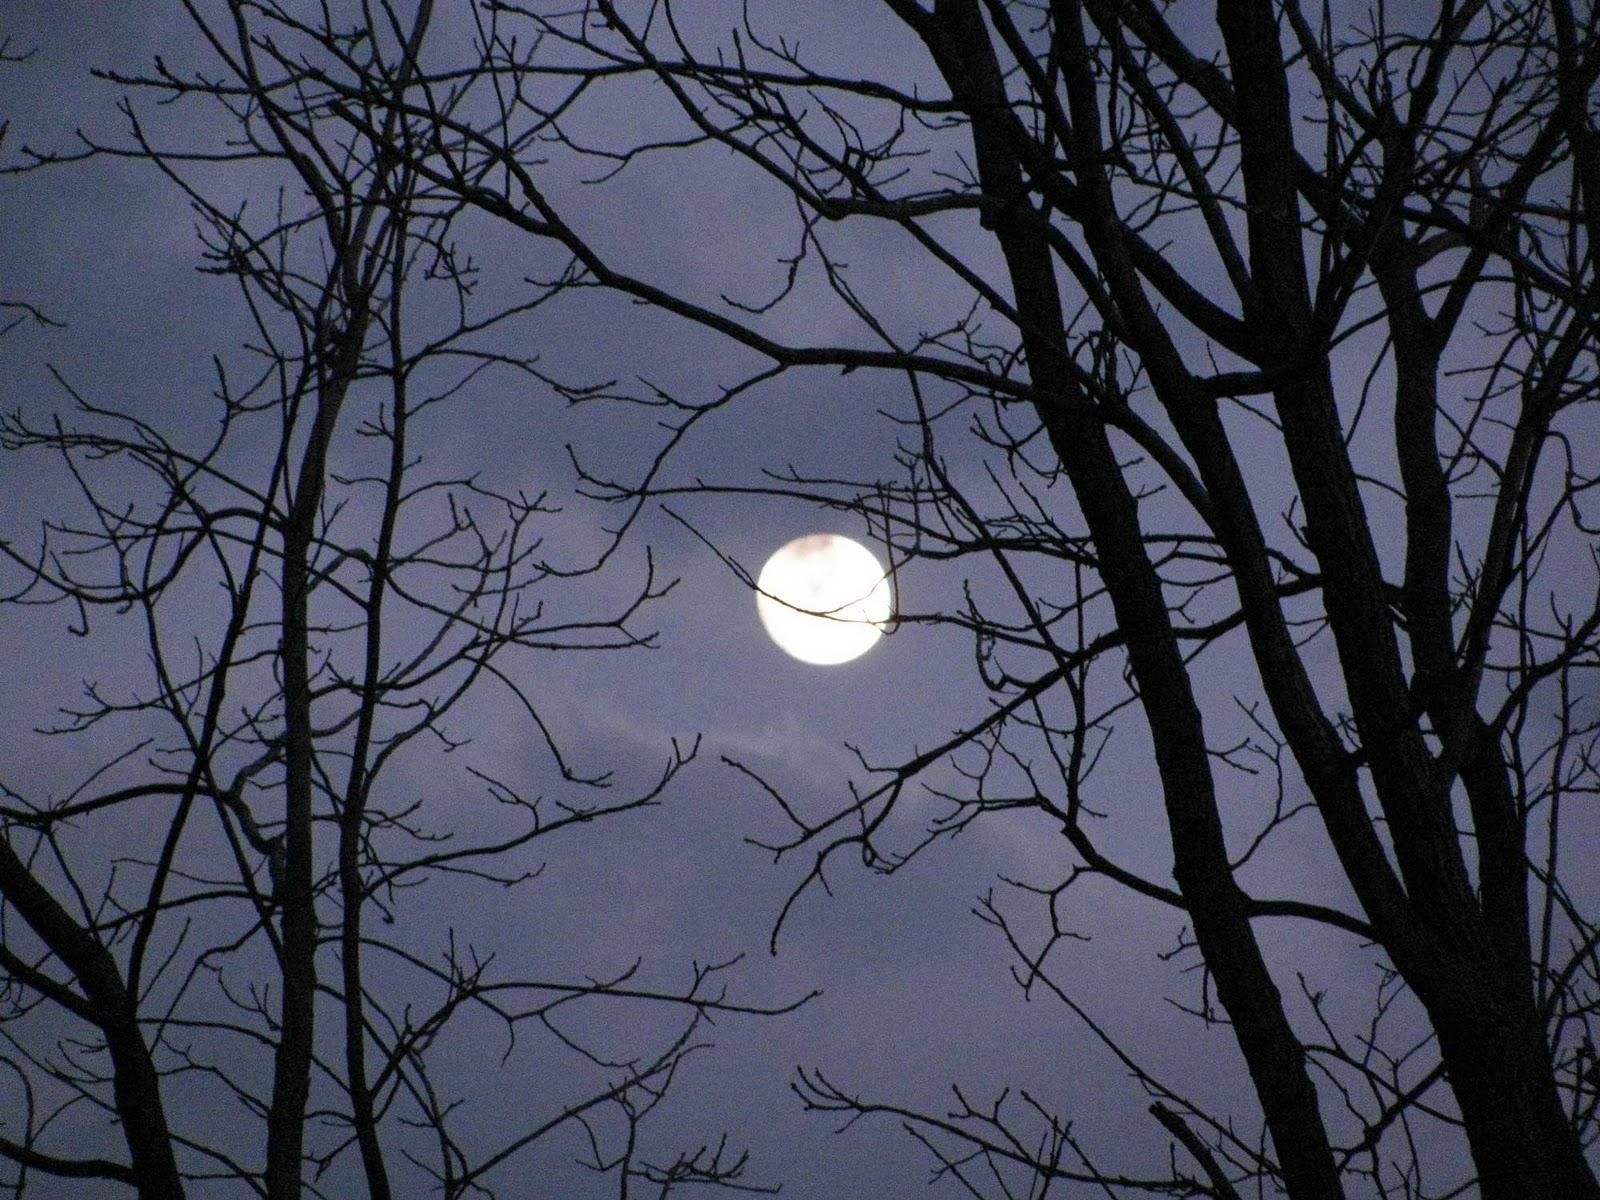 http://3.bp.blogspot.com/-pICEYNNzN9M/TVyZfxGehnI/AAAAAAAAEZM/Hep3PdUzwpk/s1600/February-Full-Moon.jpg